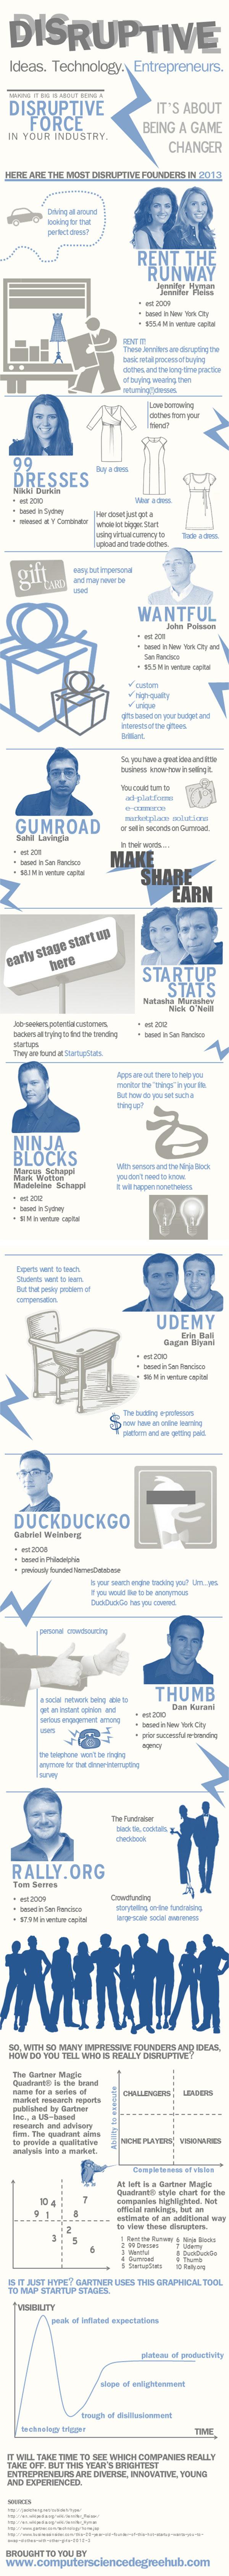 disruptive-entrepreneurs-infographic